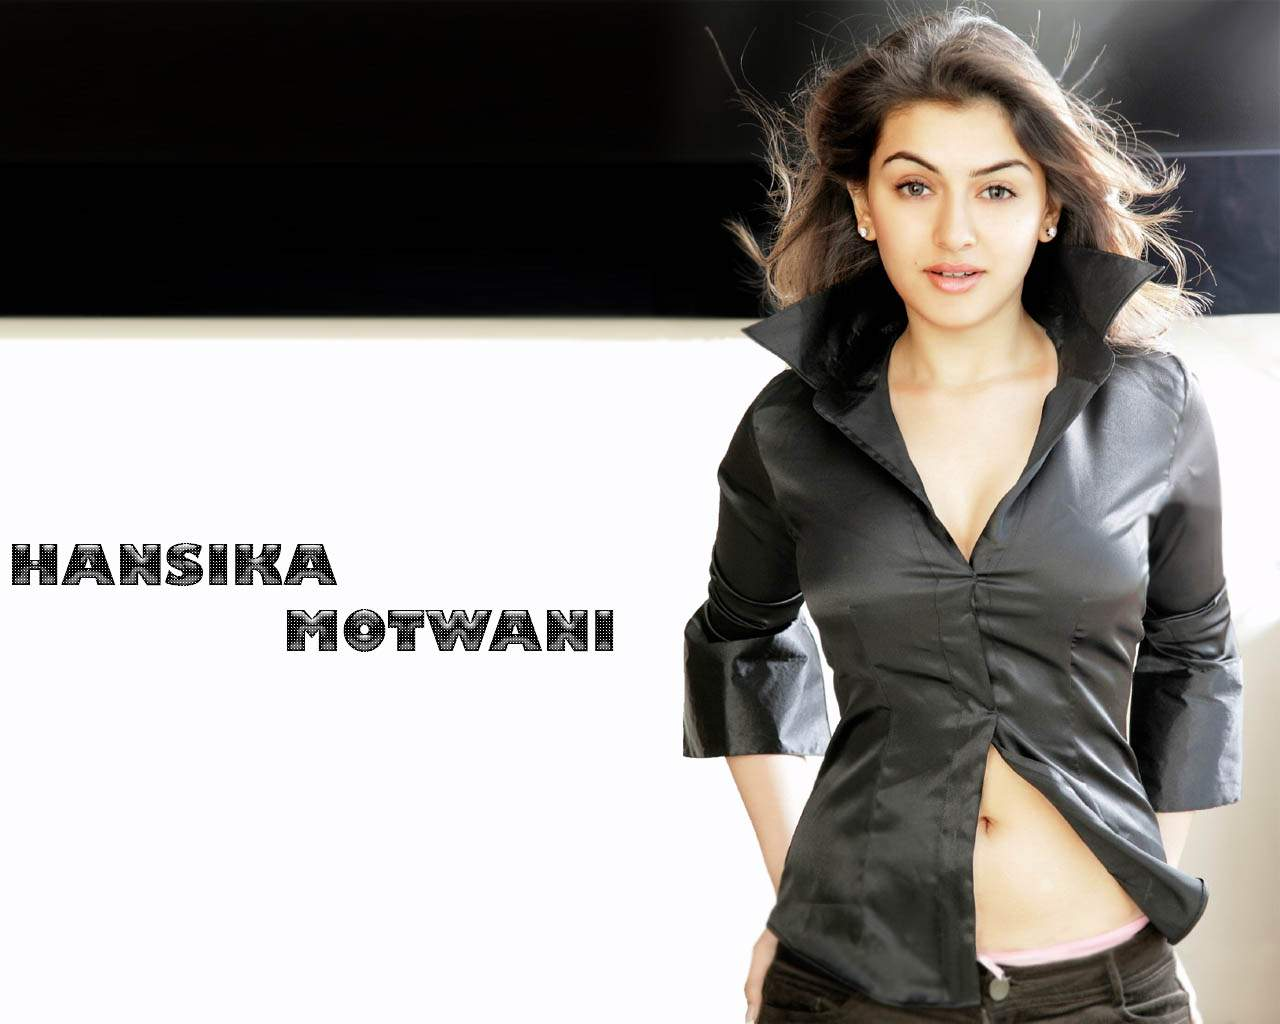 Wallpaper 7 Actress Hansika Motwani Hot Wallpapers-5508